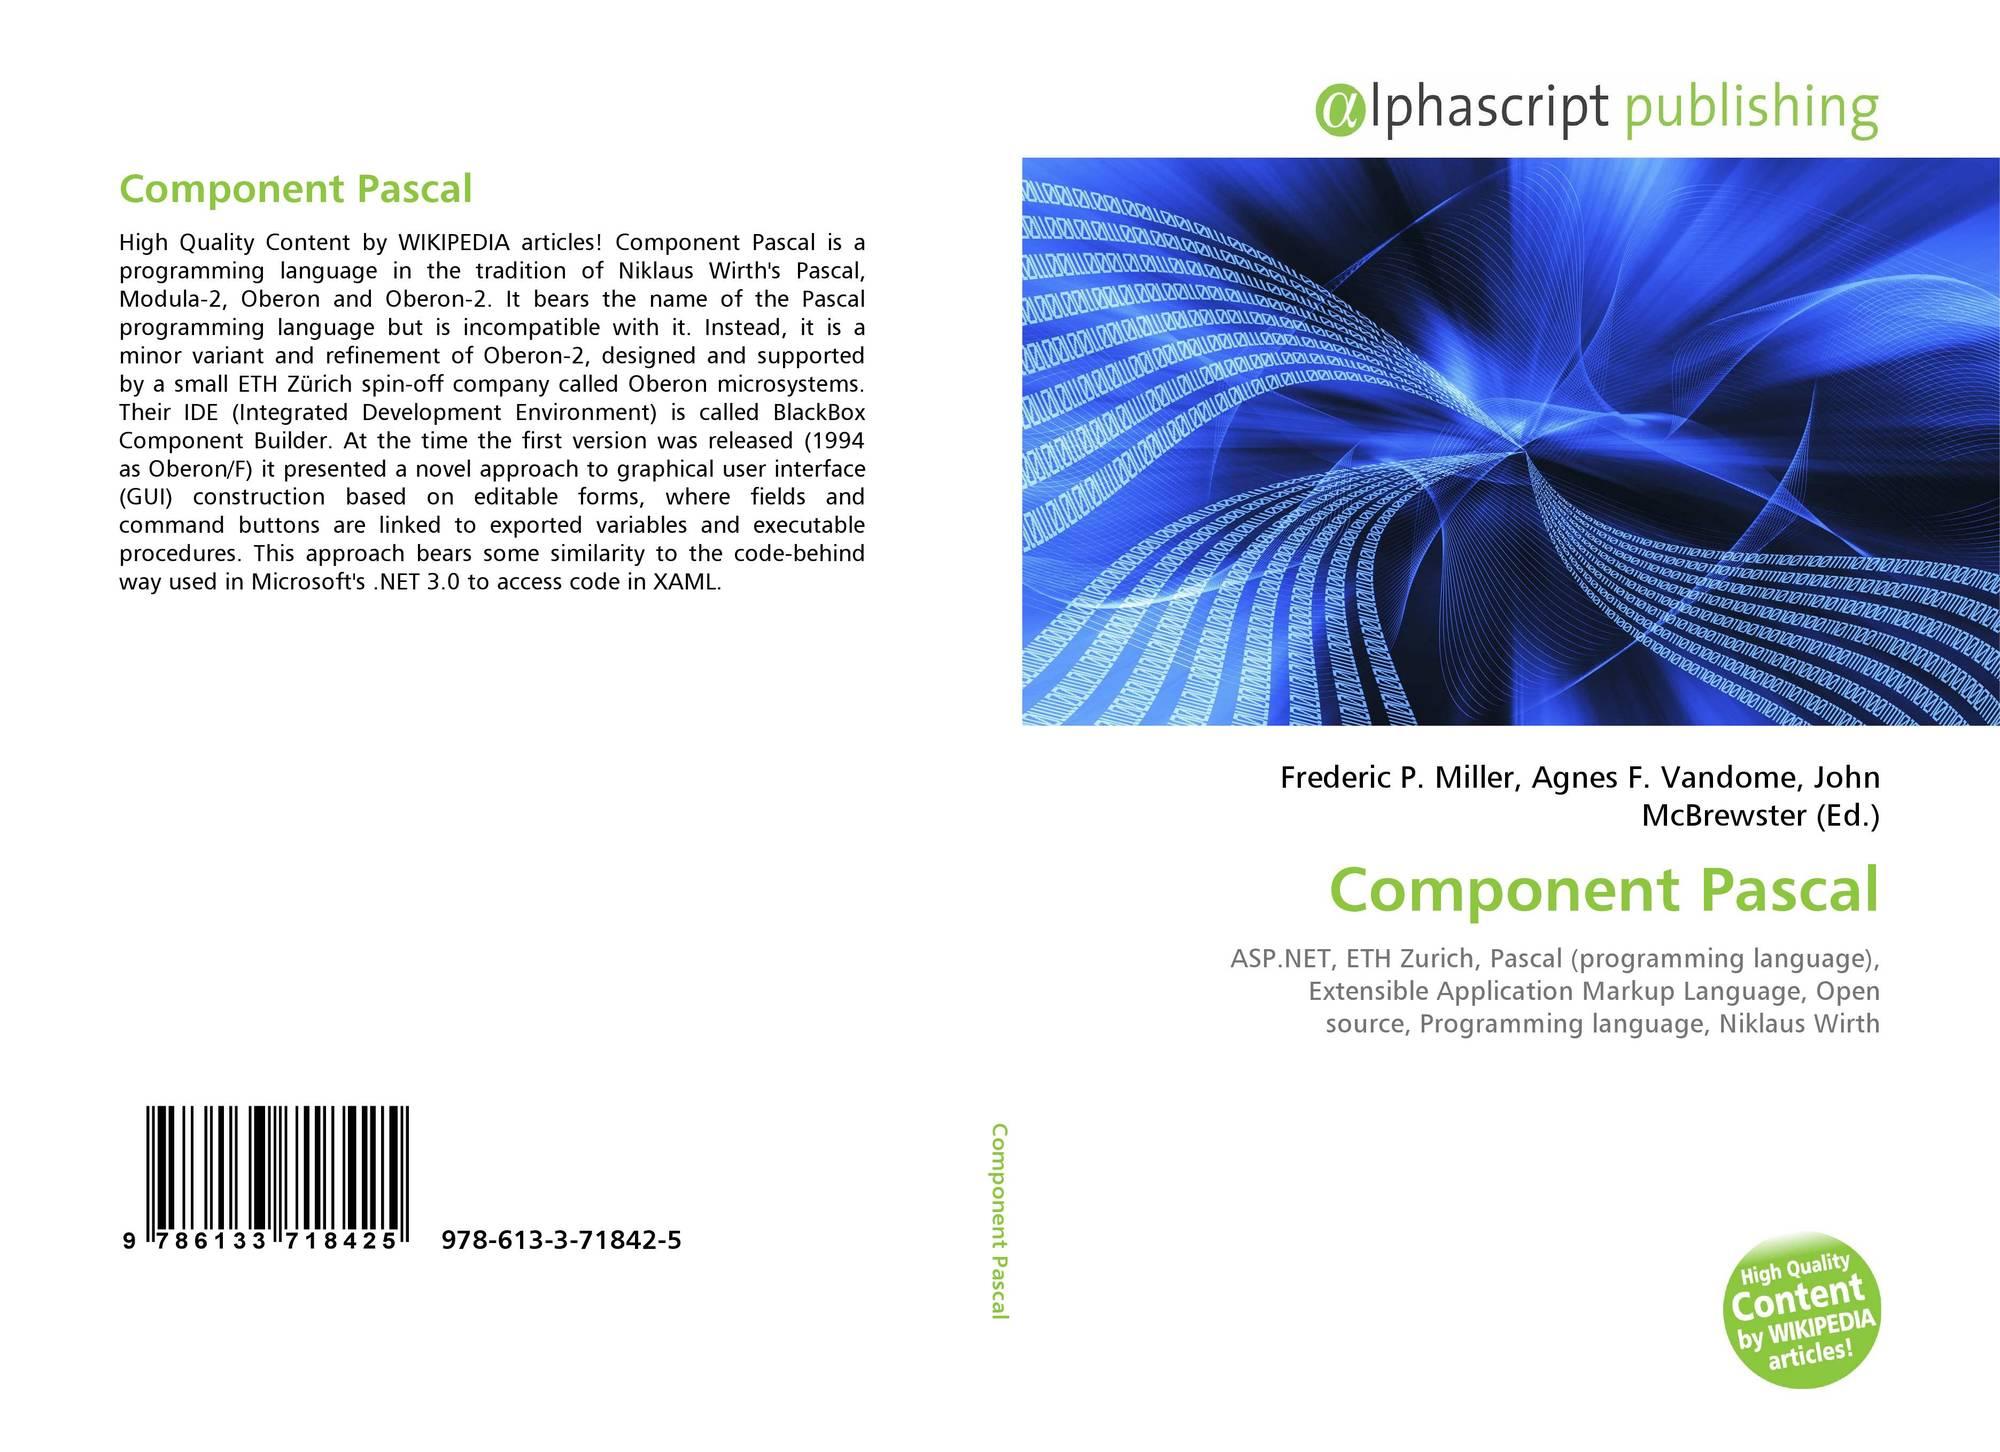 Component Pascal, 978-613-3-71842-5, 6133718420 ,9786133718425